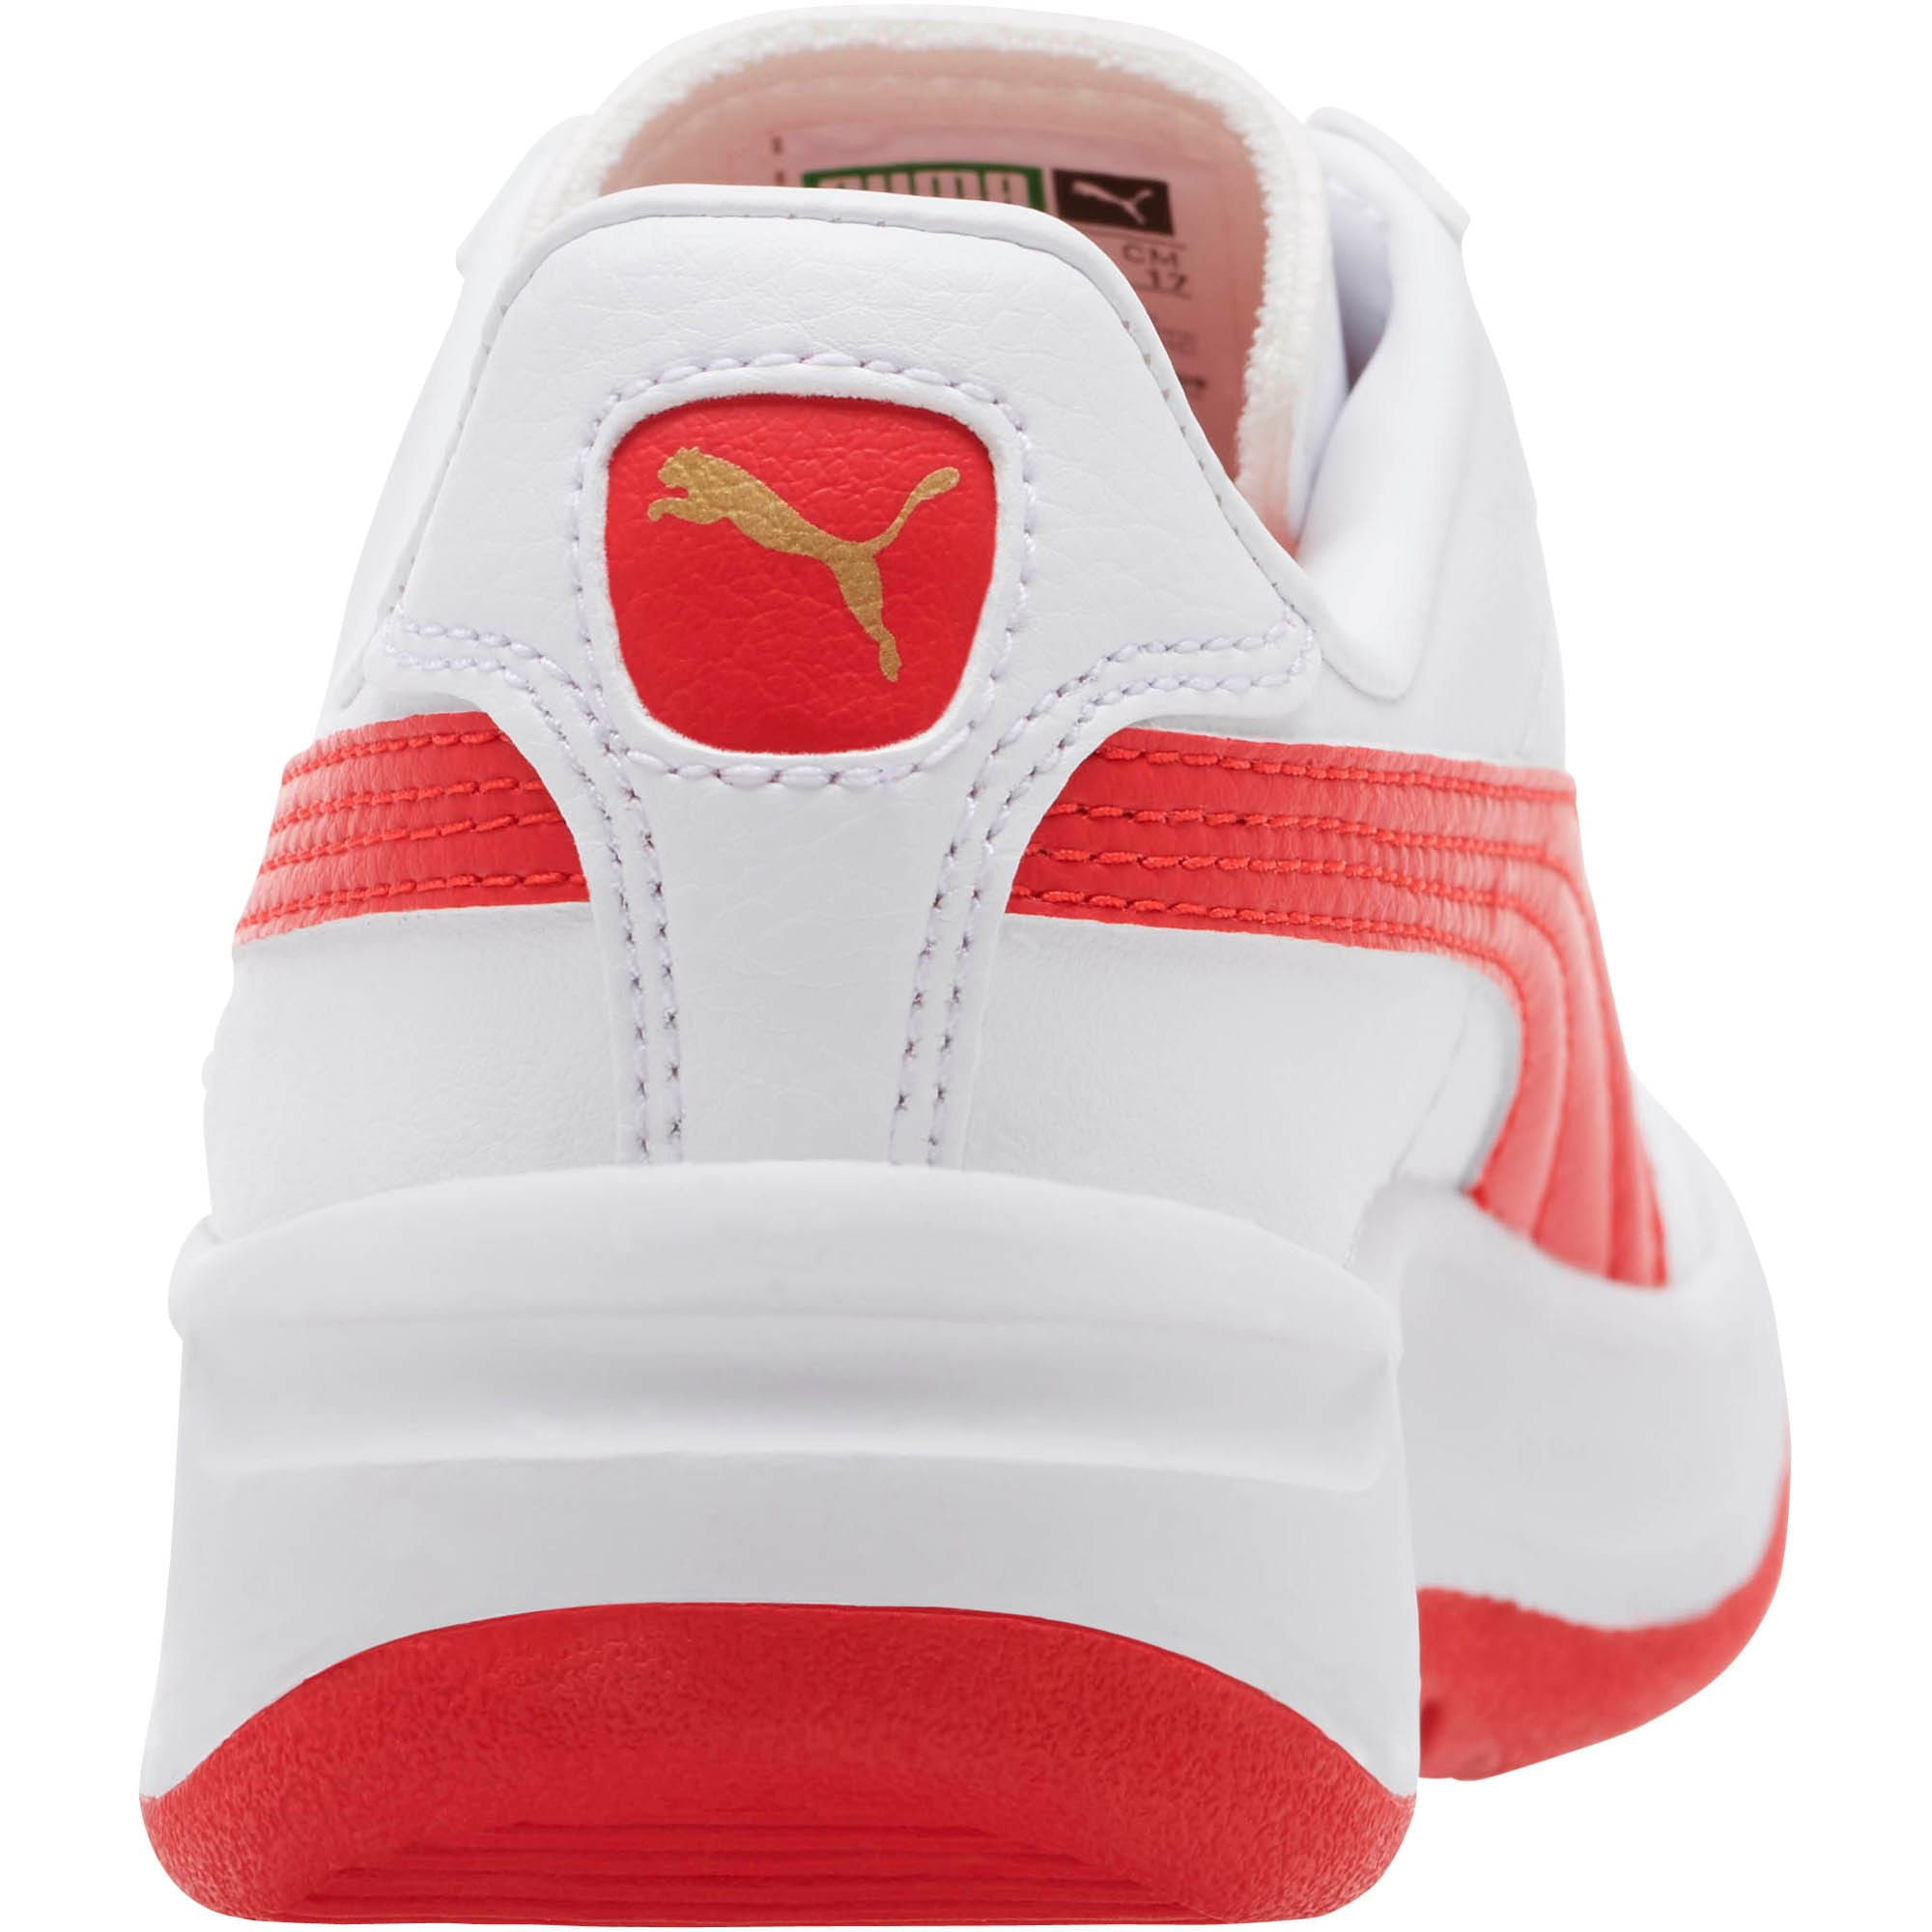 Thumbnail 4 of GV Special Little Kids' Shoes, Puma White-Ribbon Red, medium